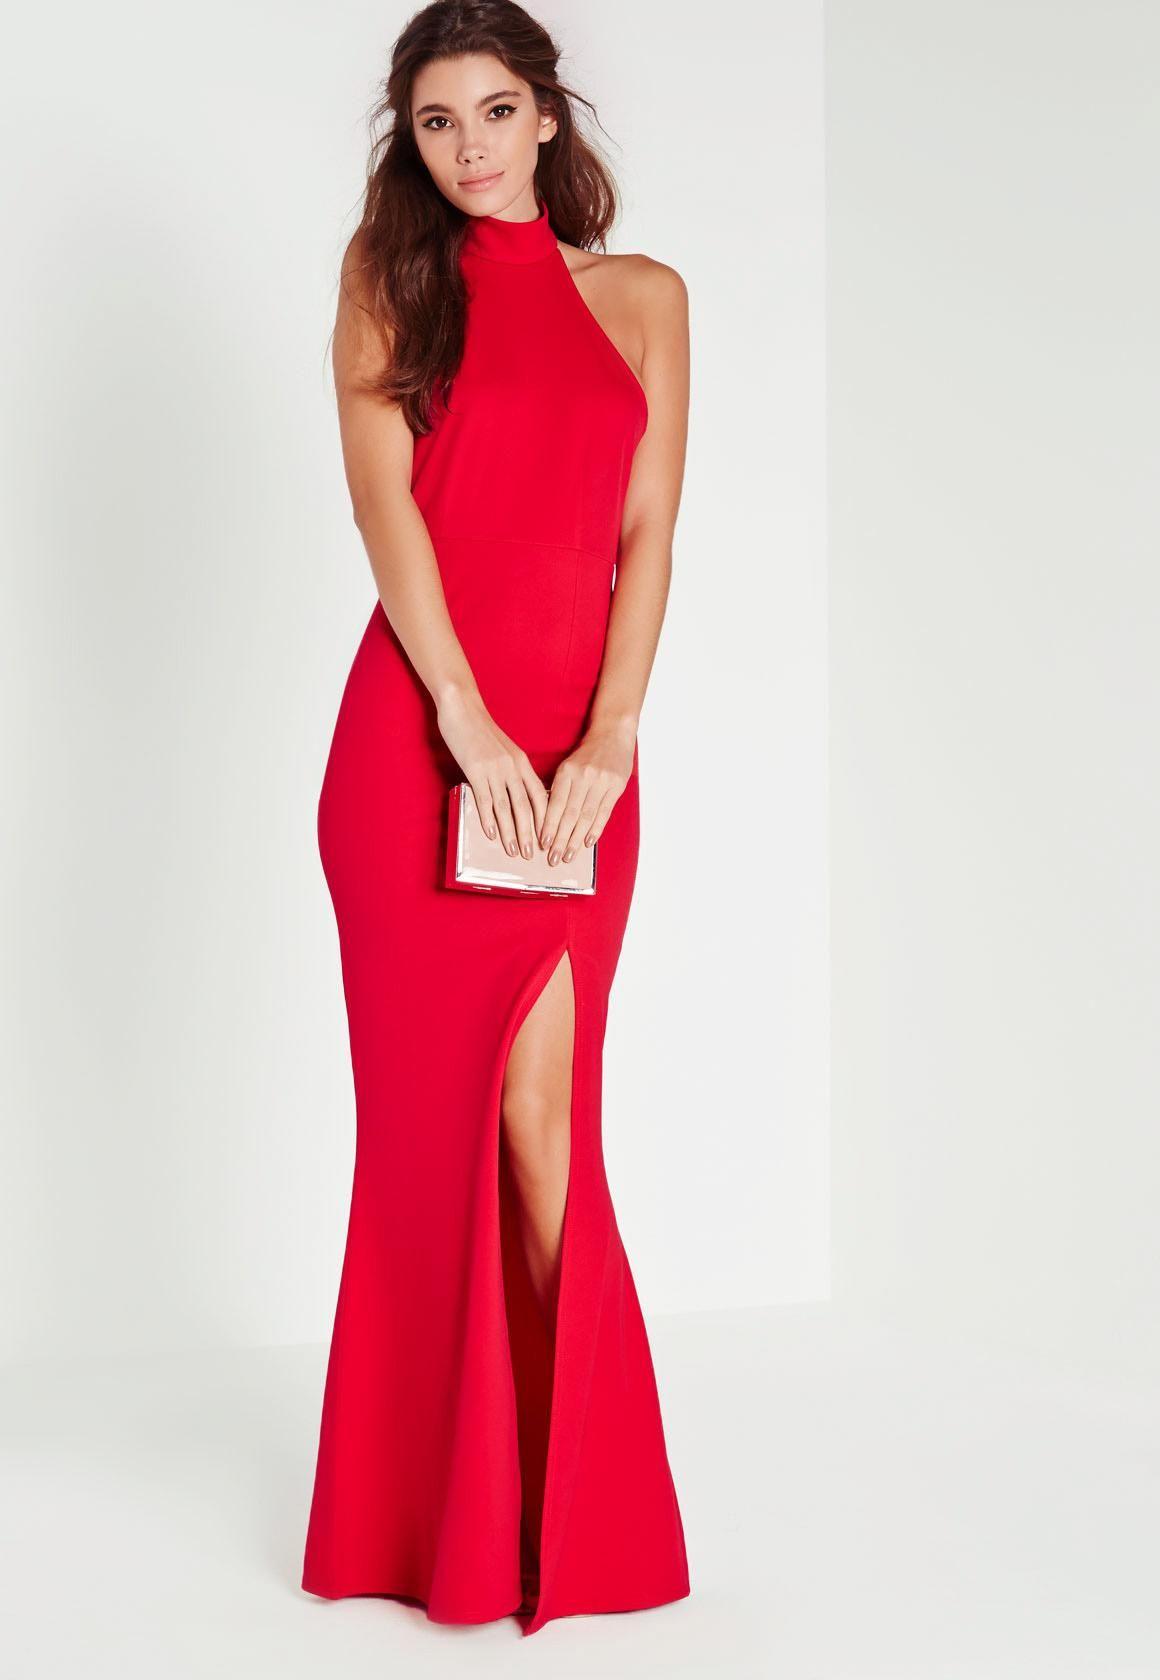 Choker Maxi Dress Red | Pinterest | Missguided, Choker and Maxi dresses